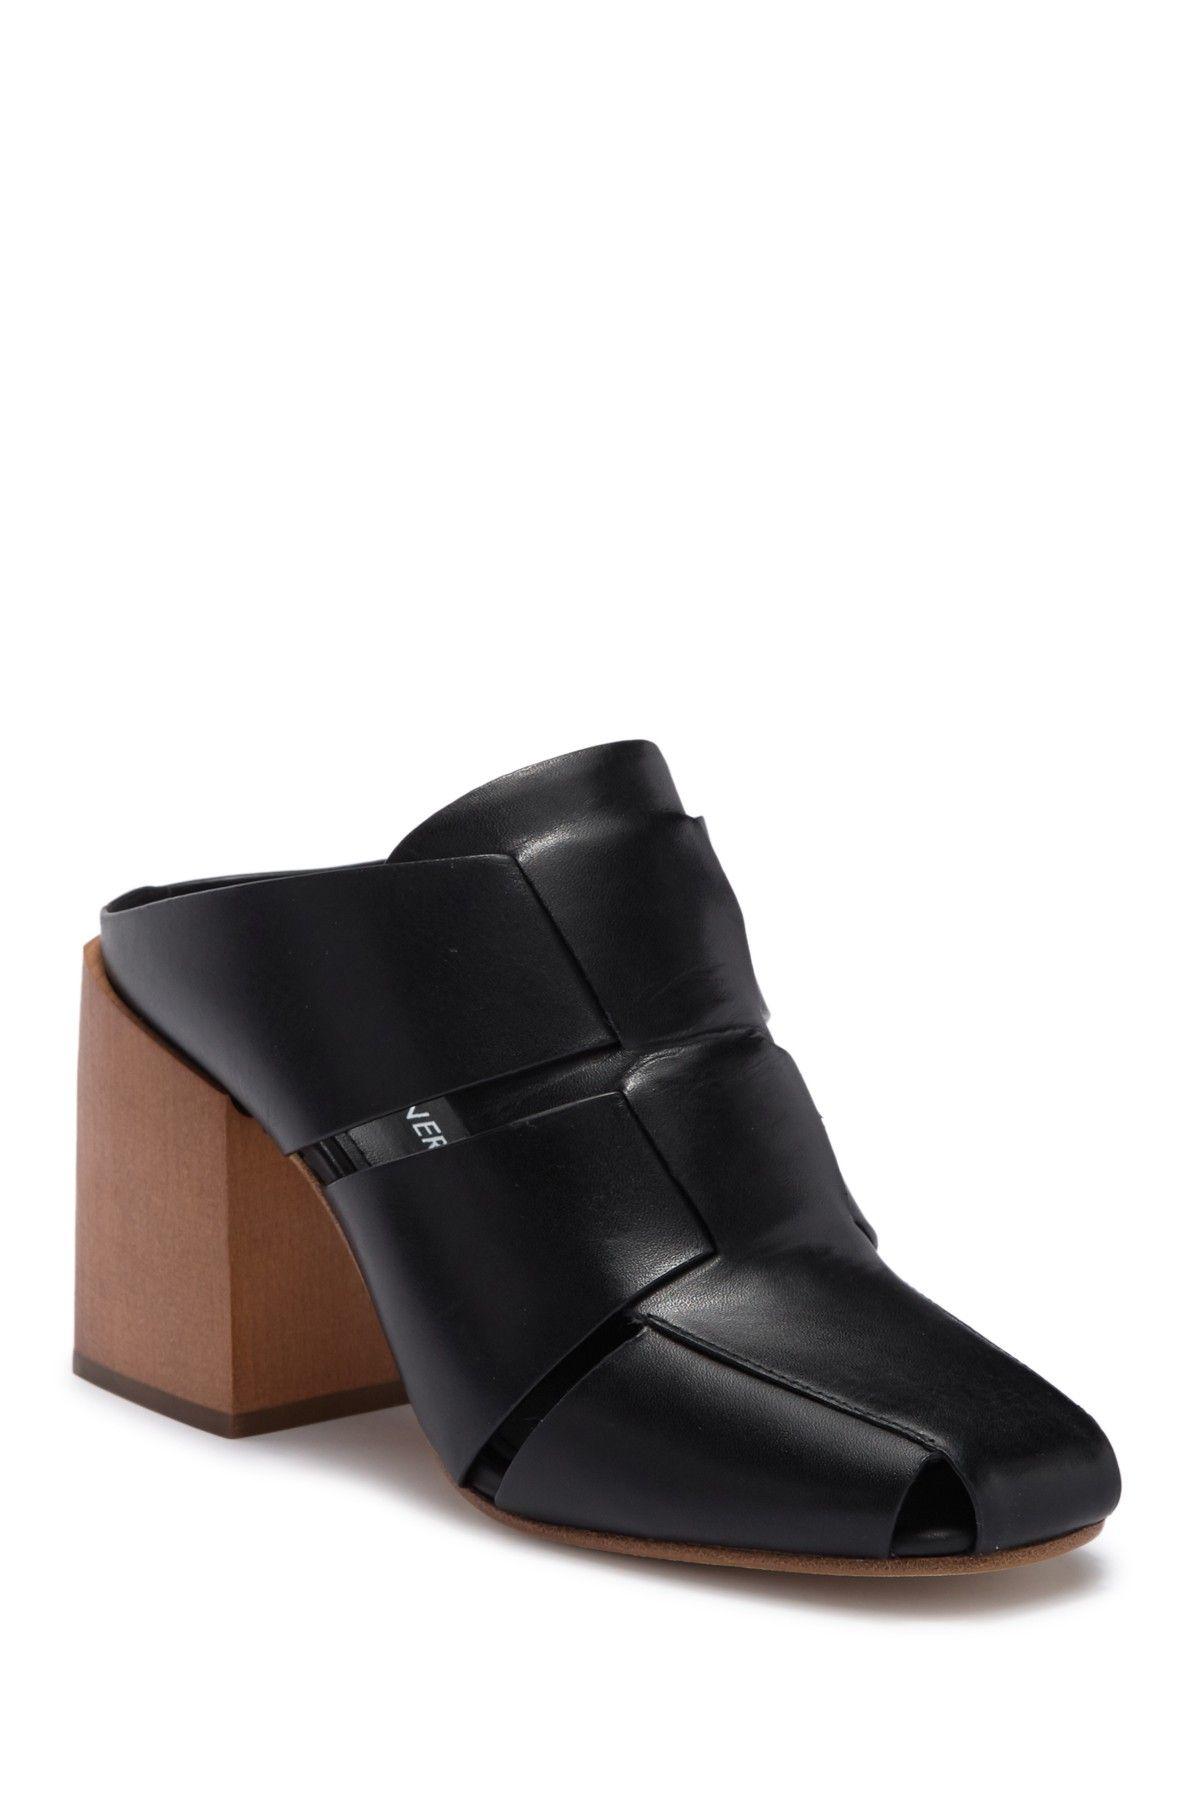 5b7368b14ec Image of Donald Pliner Lilia Block Heel Sandal Block Heels